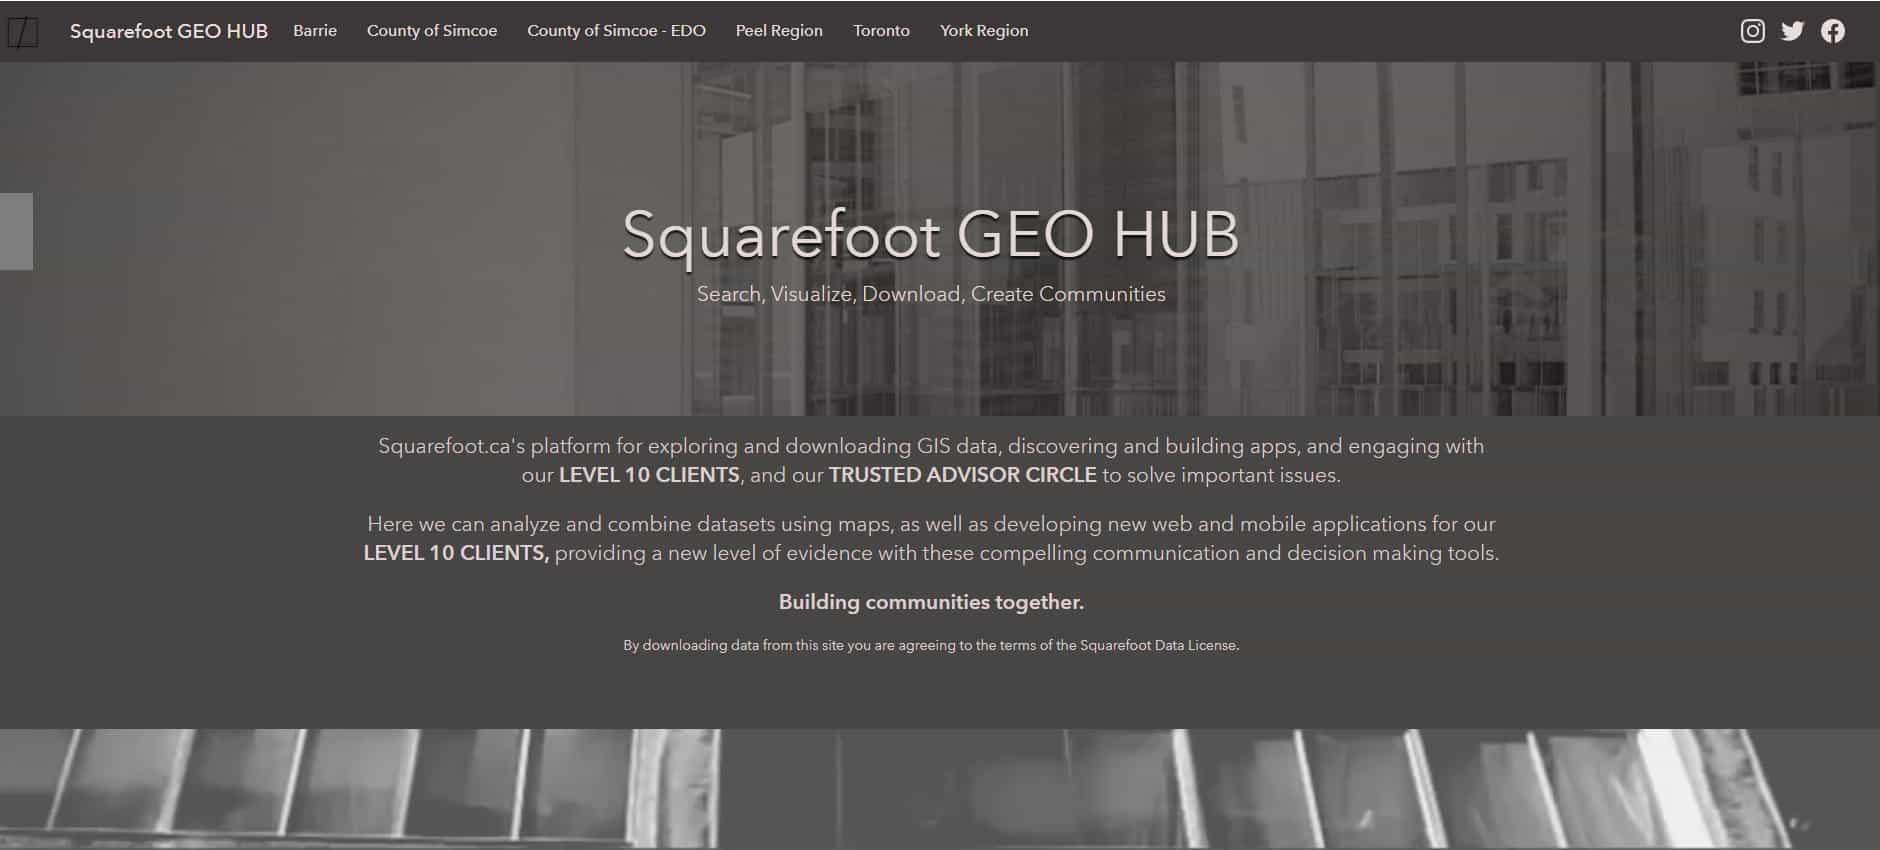 Squarefoot Geo Hub